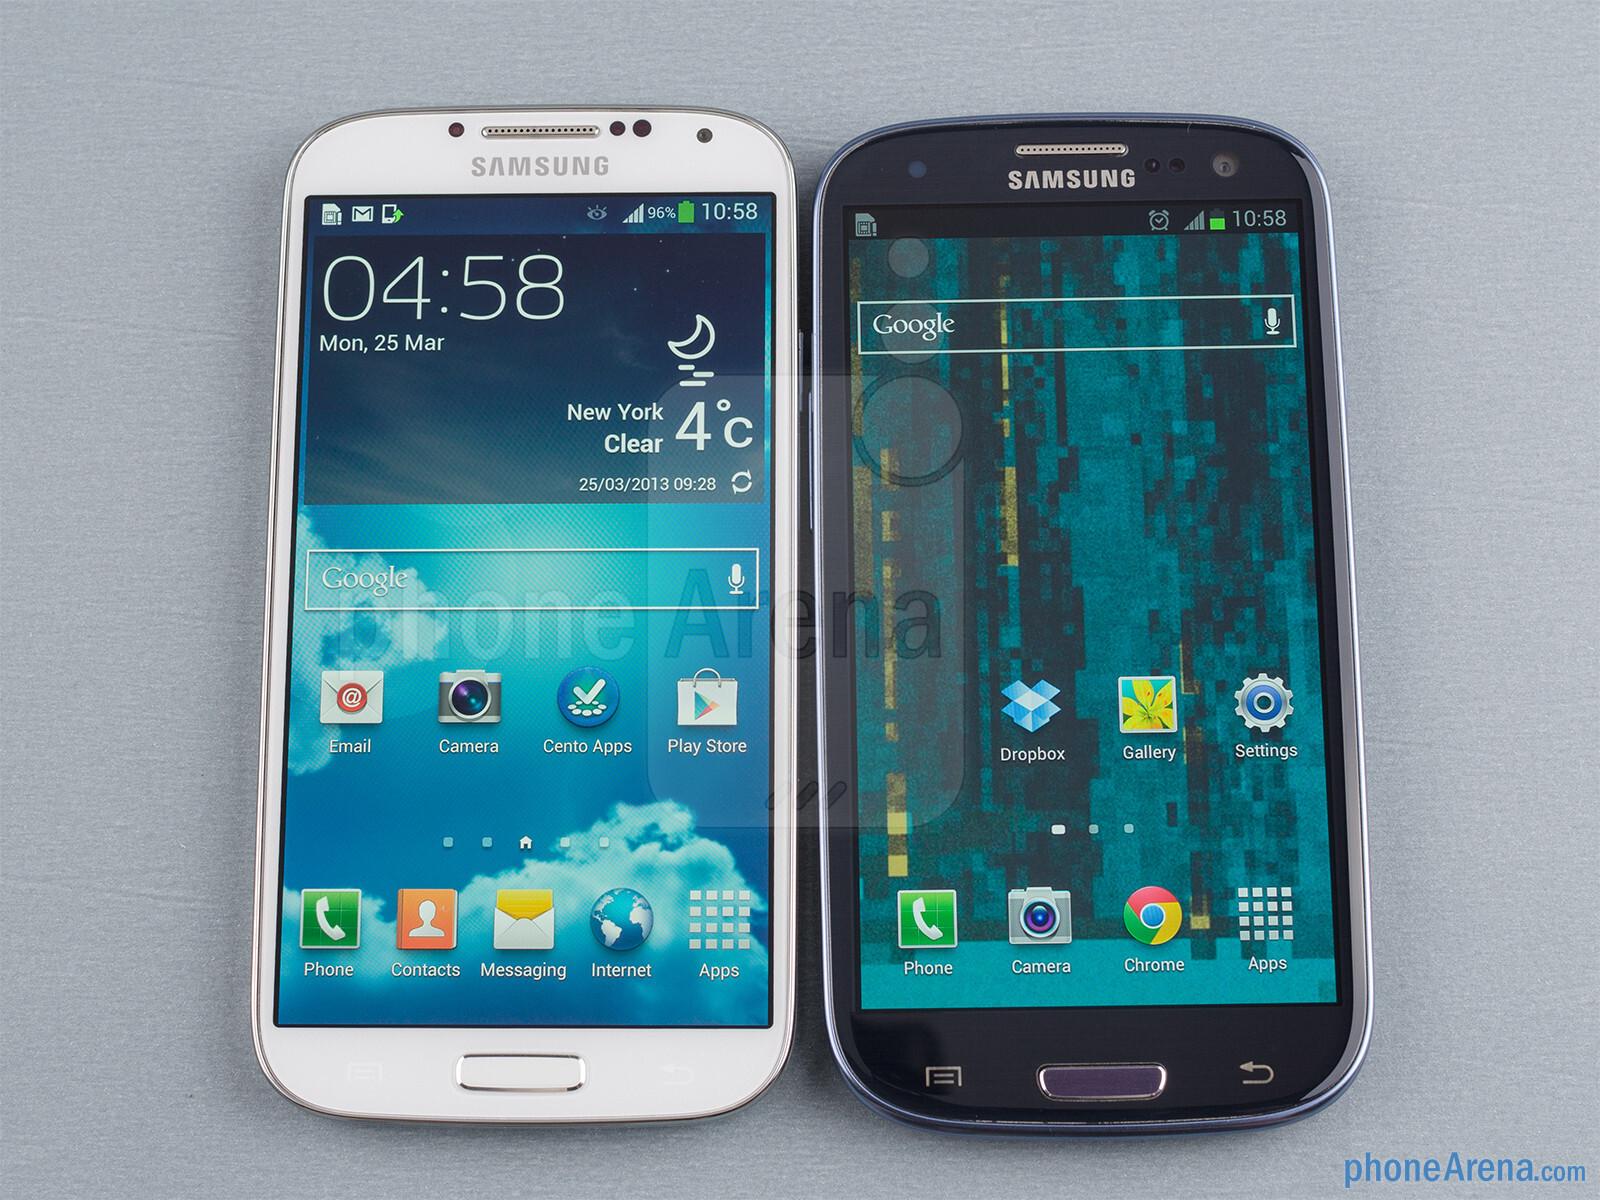 Samsung Galaxy S4 vs Samsung Galaxy S III - Call Quality and Conclusion -  PhoneArena